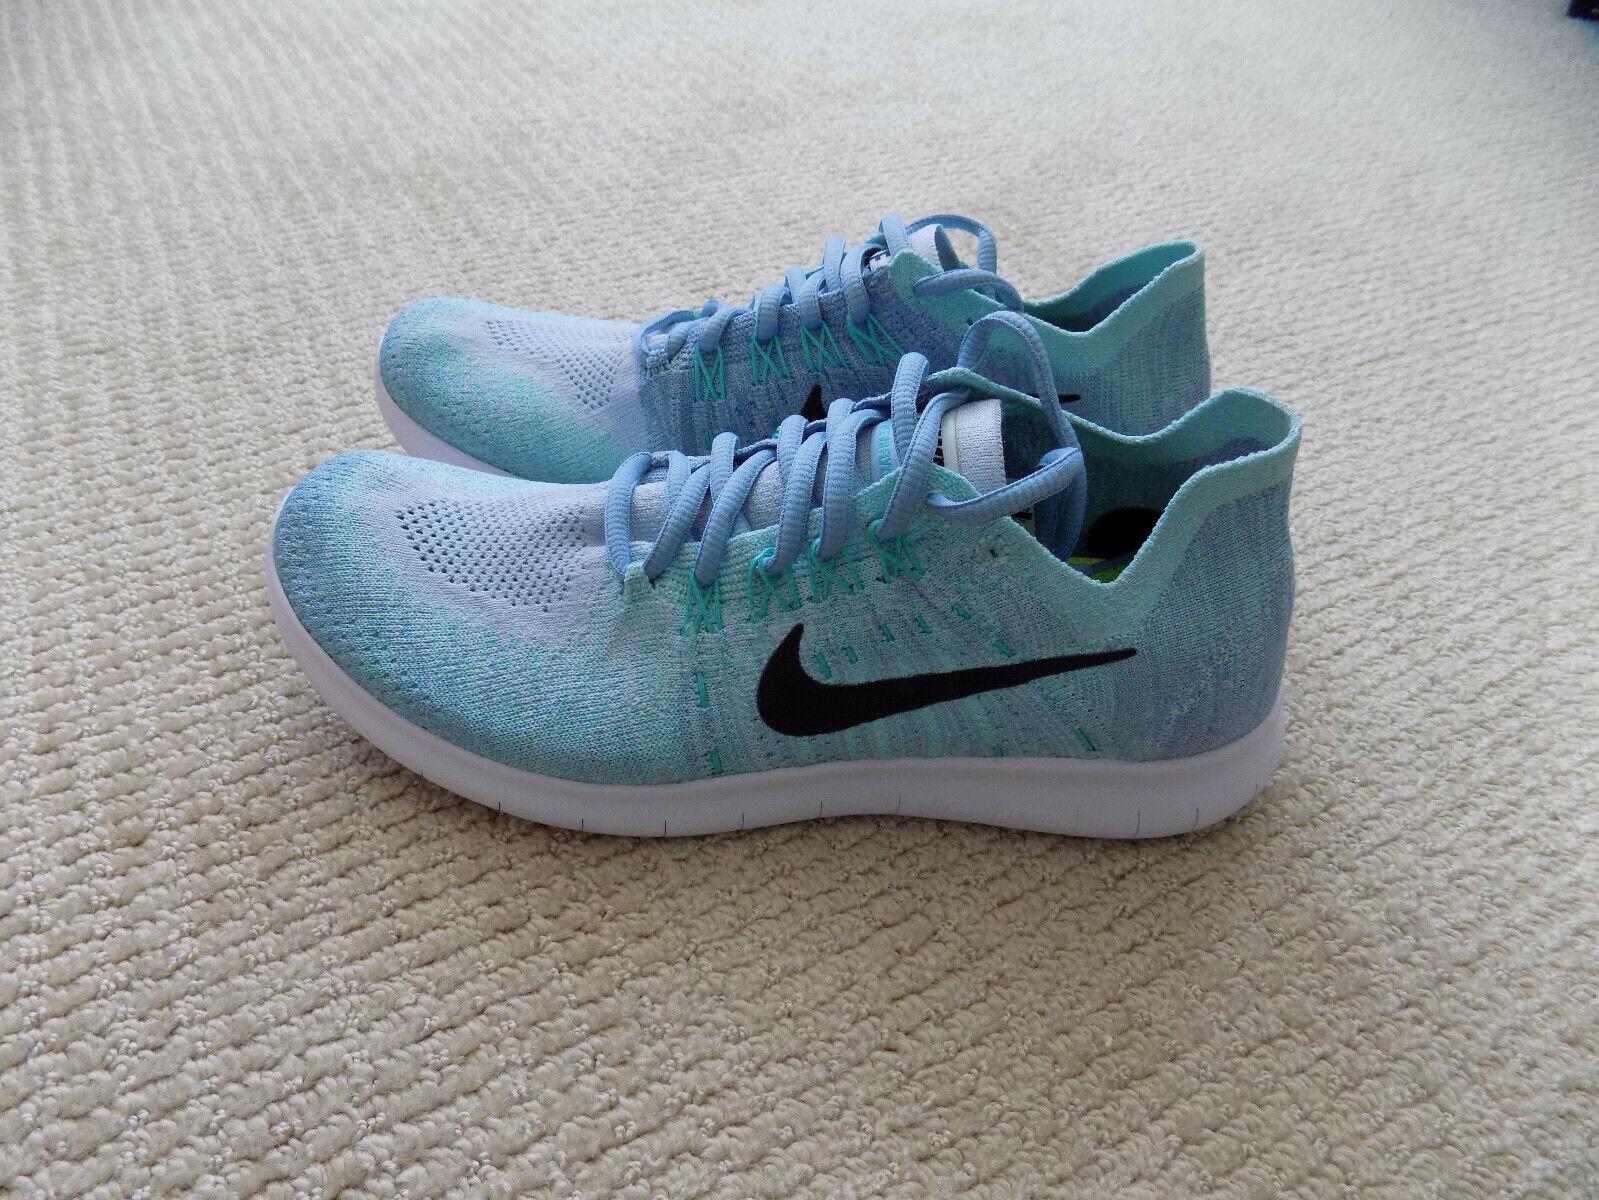 desinfectante A rayas mudo  WMNS Nike RN Flyknit 4.0 Run Blue Black Womens Running 831070-401 9 for  sale online   eBay